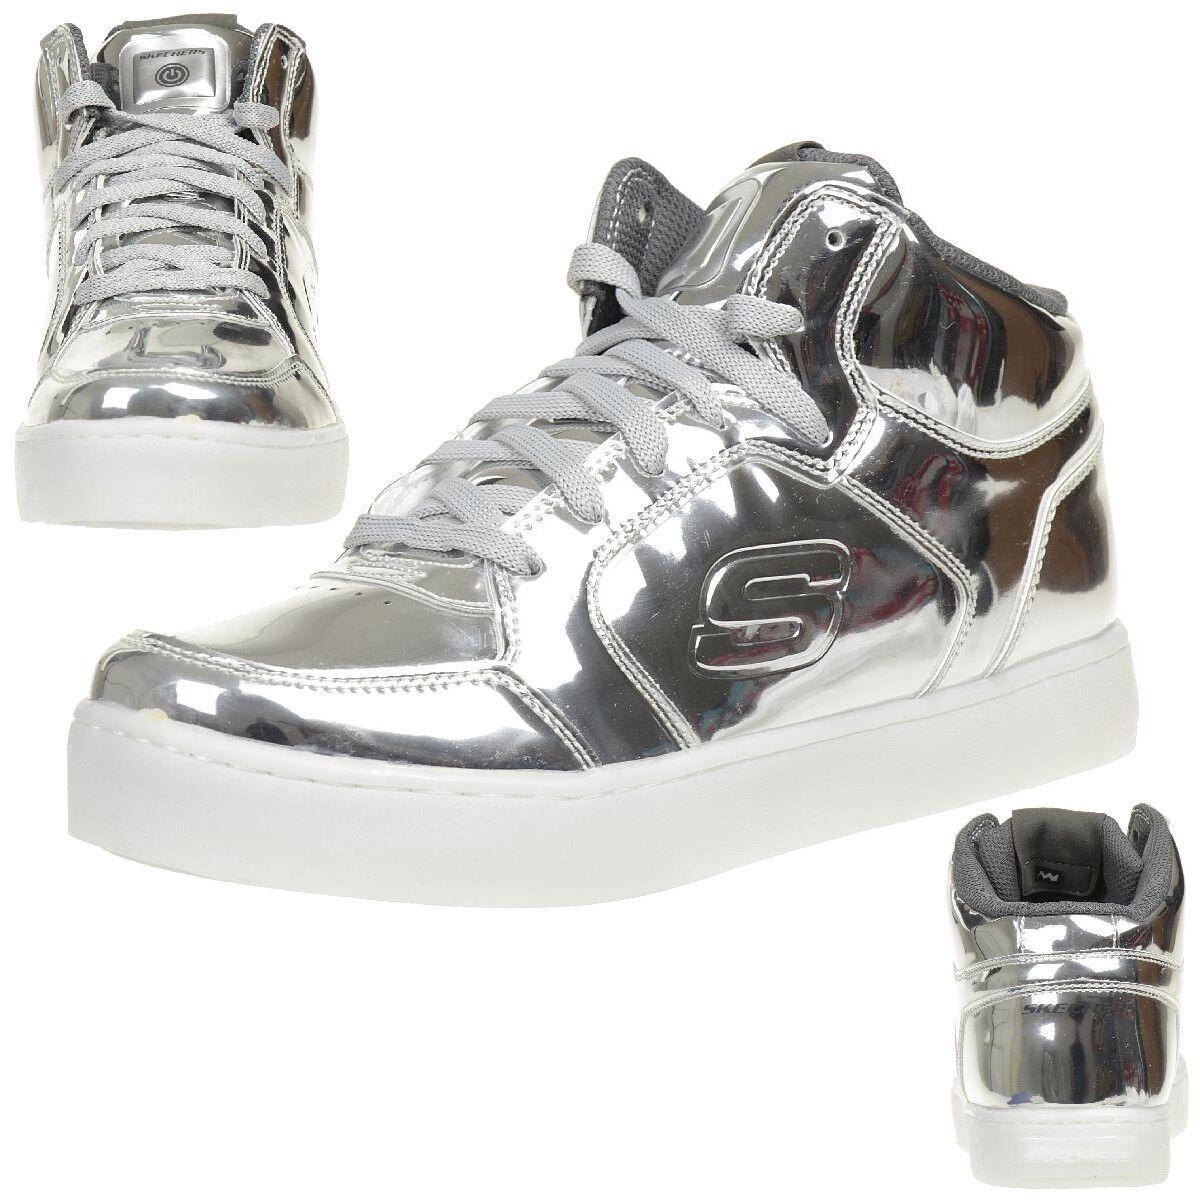 Skechers s Lights  energy LED Lights LED energy zapatillas zapatos para niños blinkzapatos Sil 4907bf